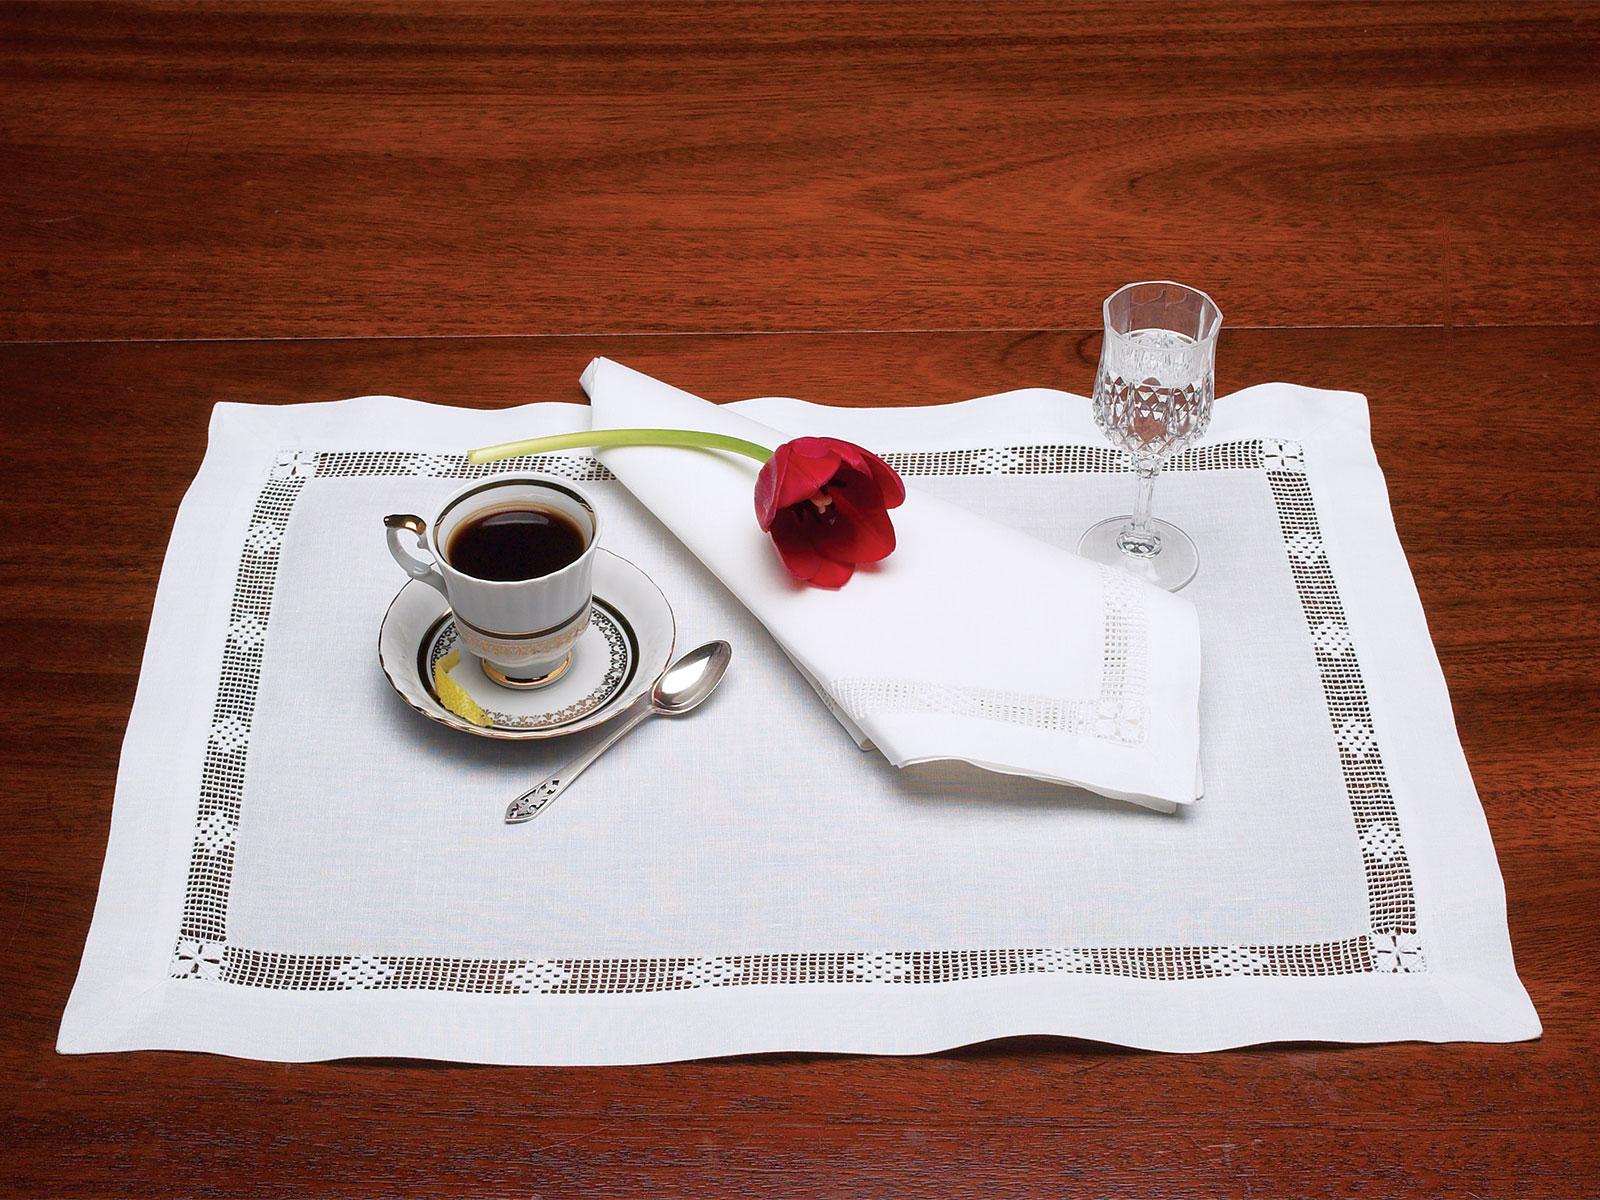 Beresford Fine Table Linens Schweitzer Linen